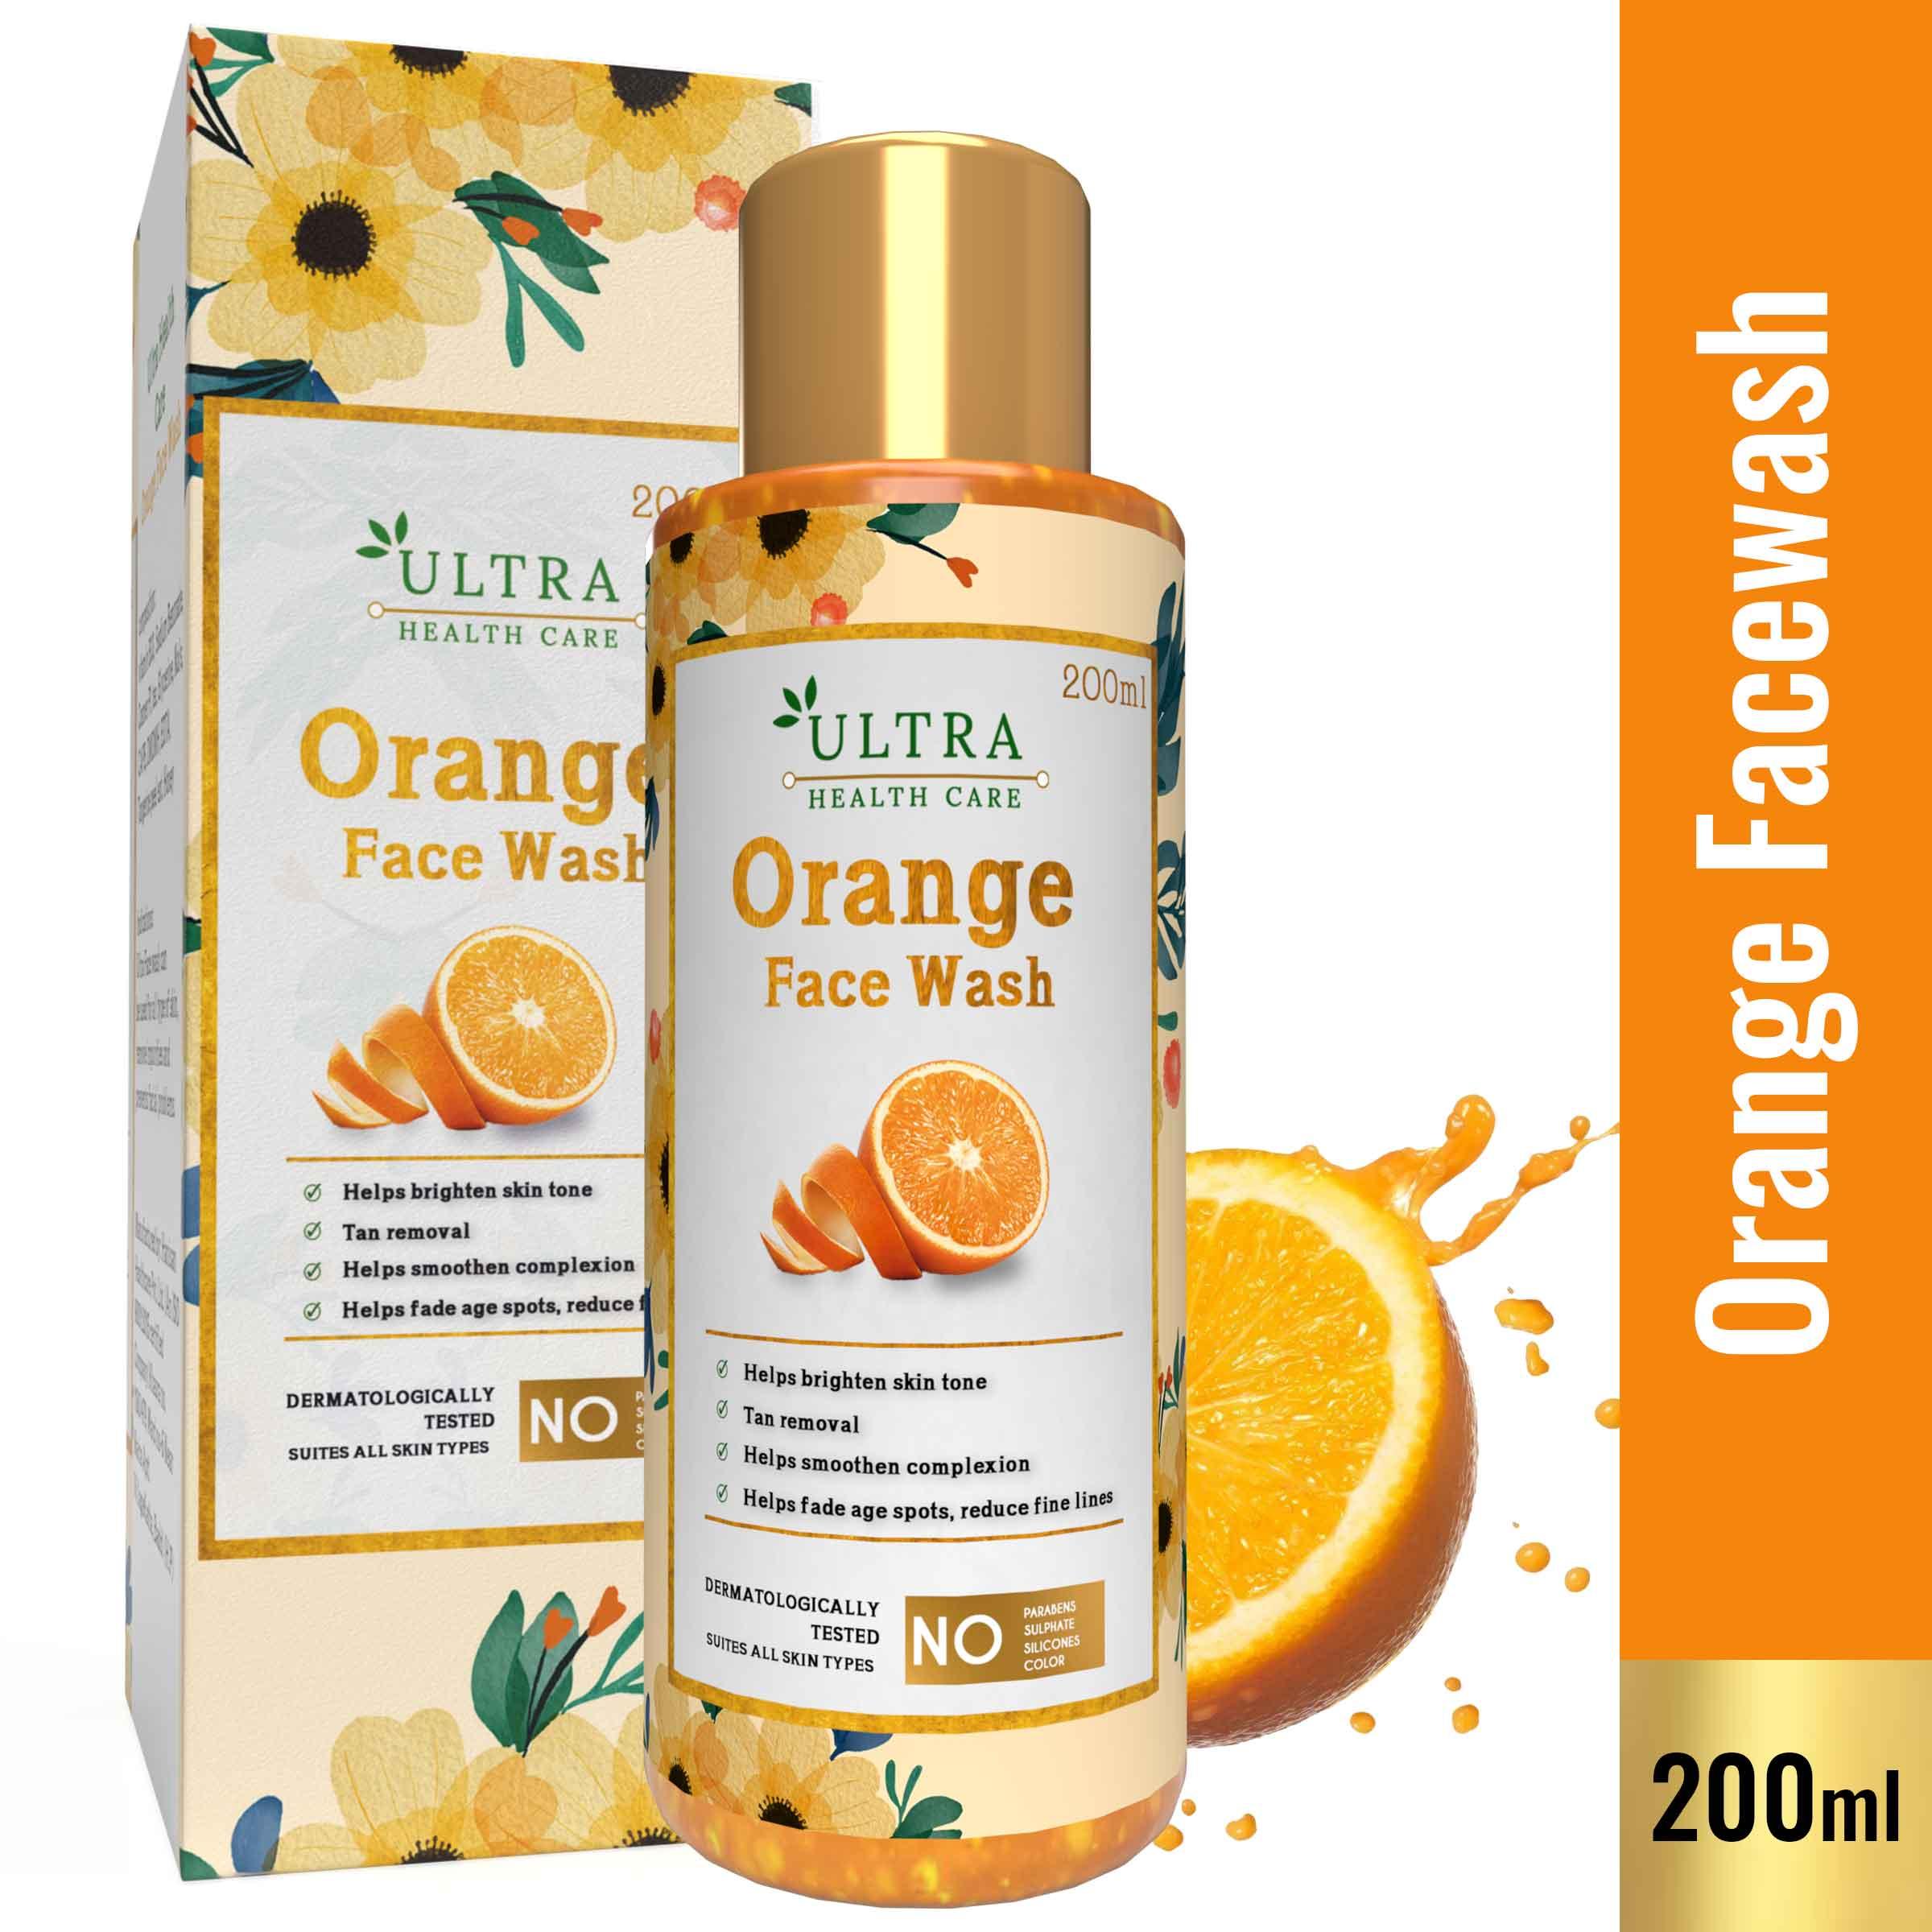 Orange Facewash Gel